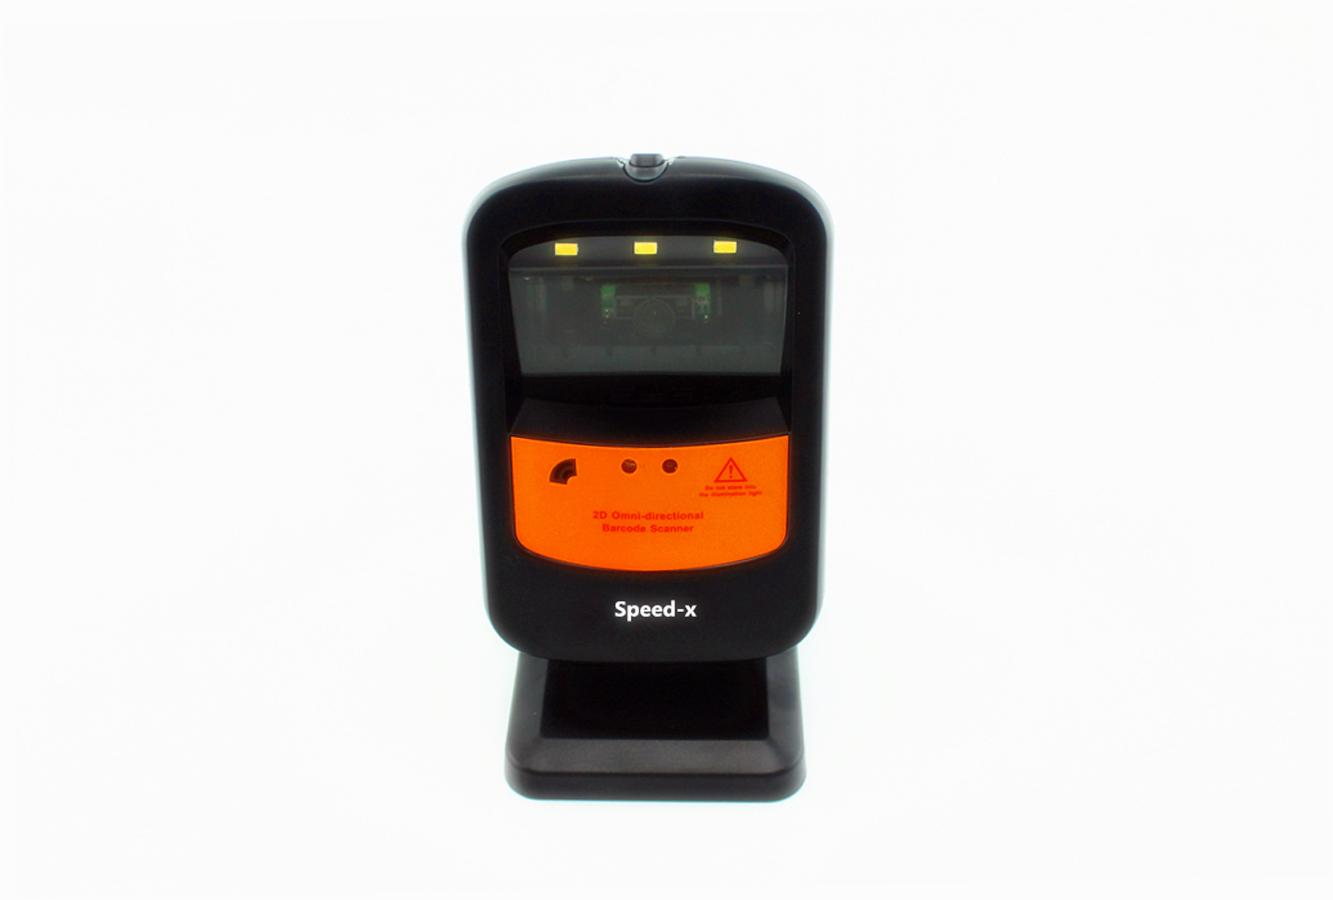 Buy Mister Online Scanners at Best Prices Online in Pakistan - daraz pk